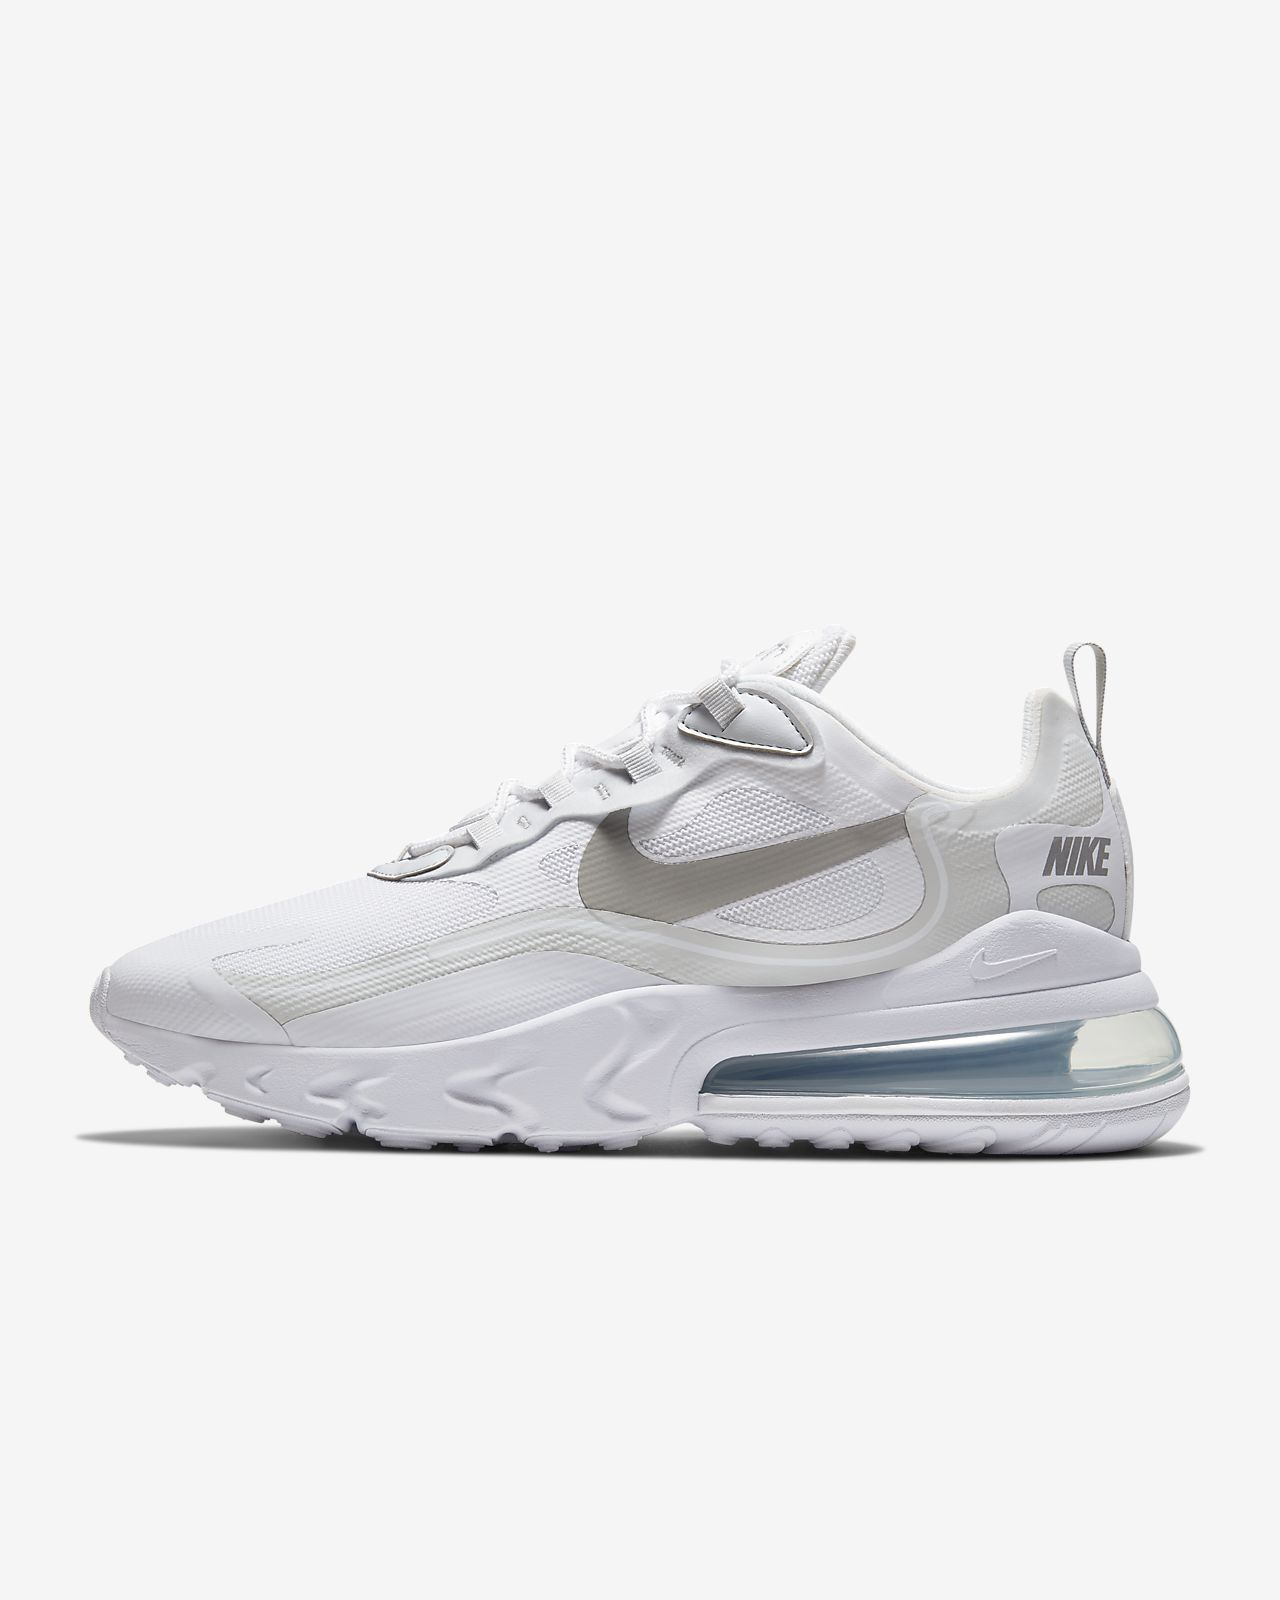 nike sneakers men, 90 Mens Shoes WhiteLight Grey, nike air